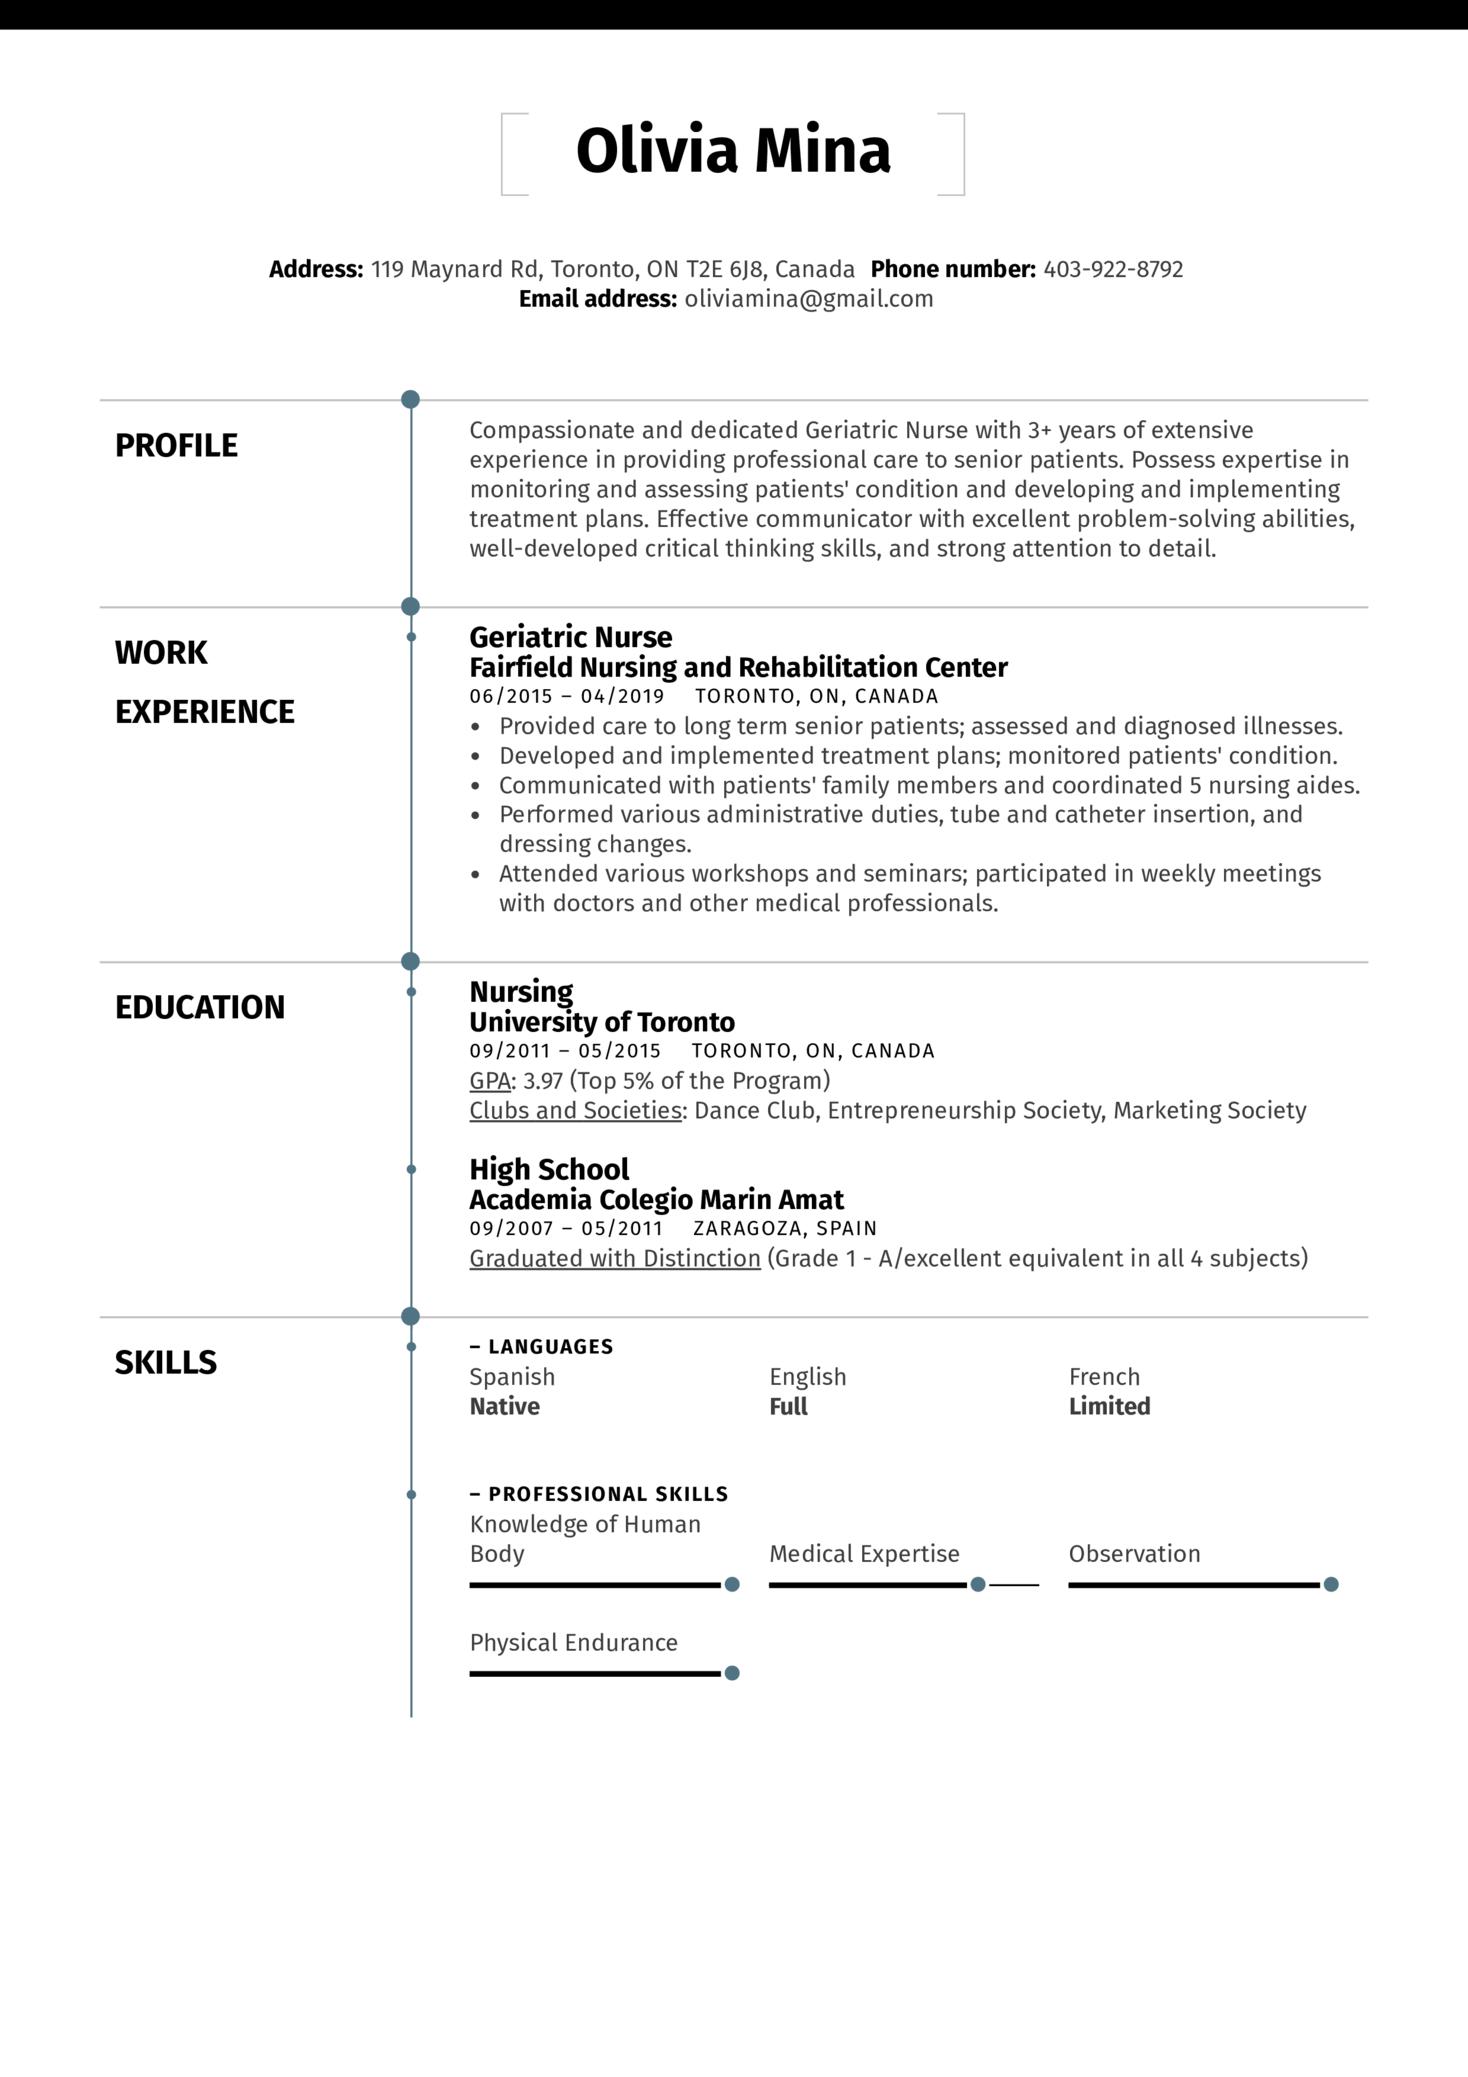 Geriatric Nurse Resume Sample (Part 1)